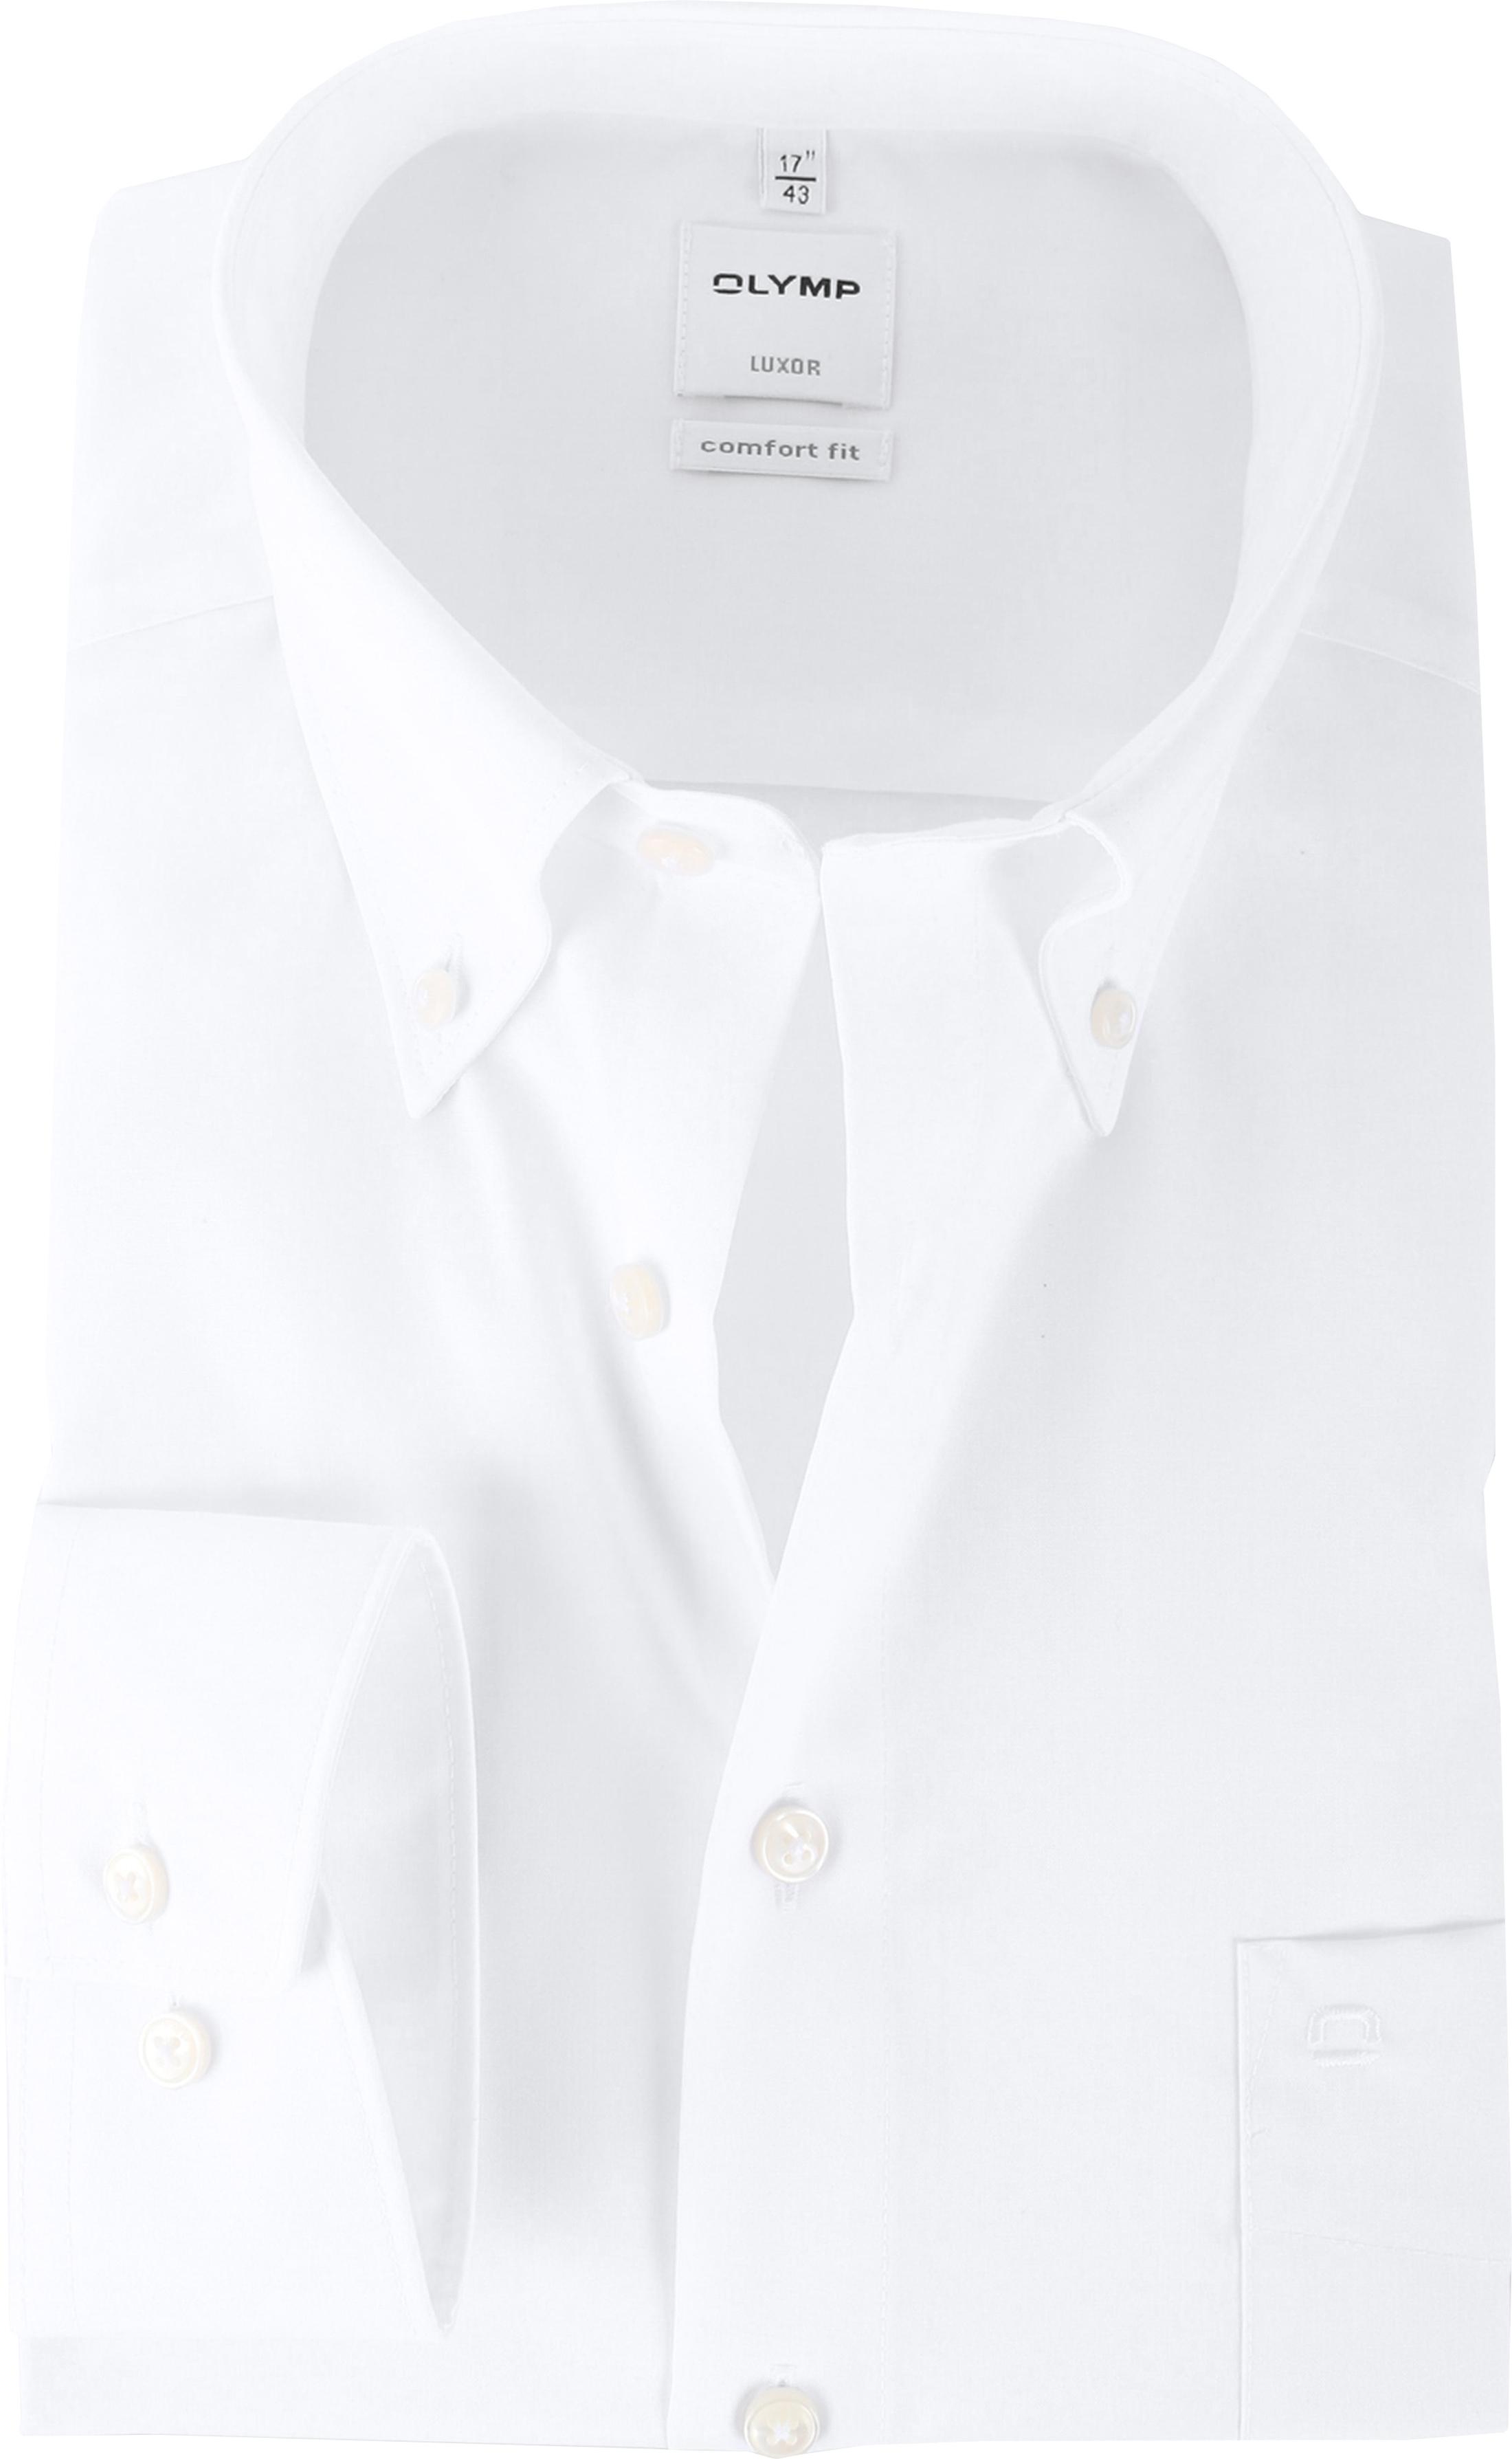 OLYMP Luxor Bügelfrei Hemd Weiß Comfort Fit foto 0